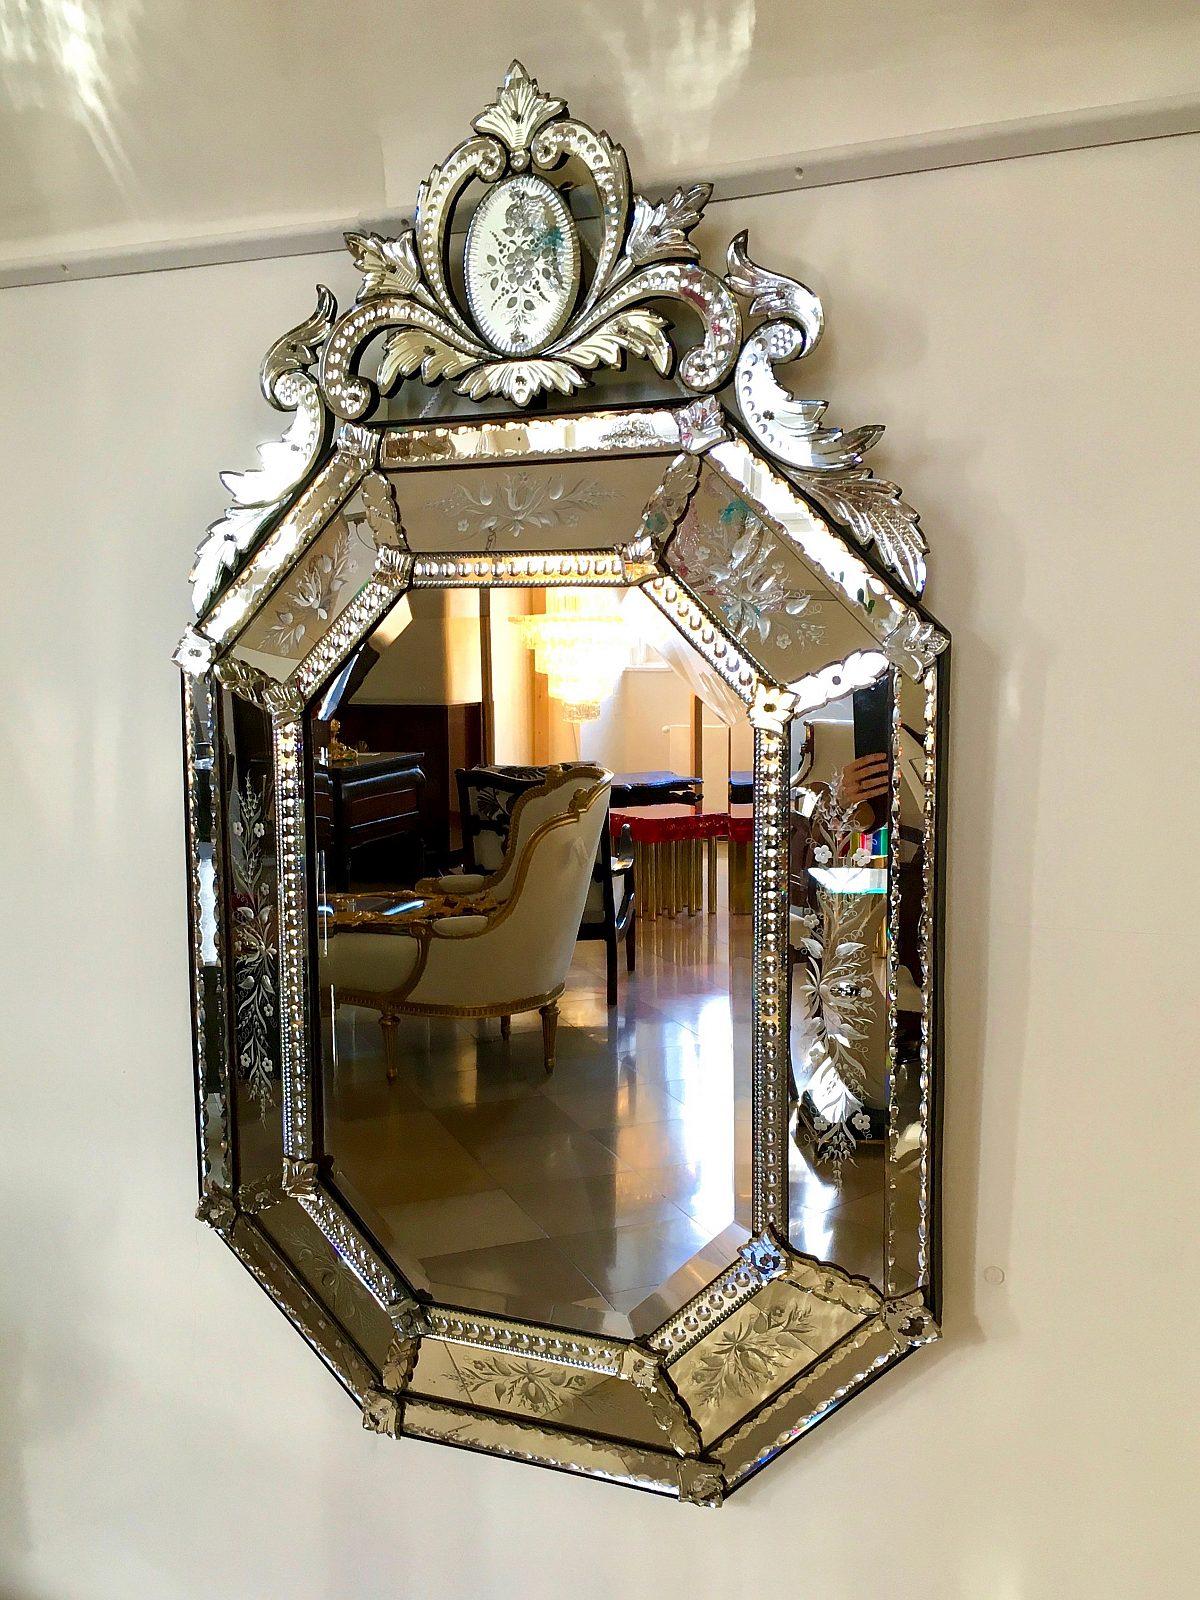 HM oktogonaler Spiegelgesamt